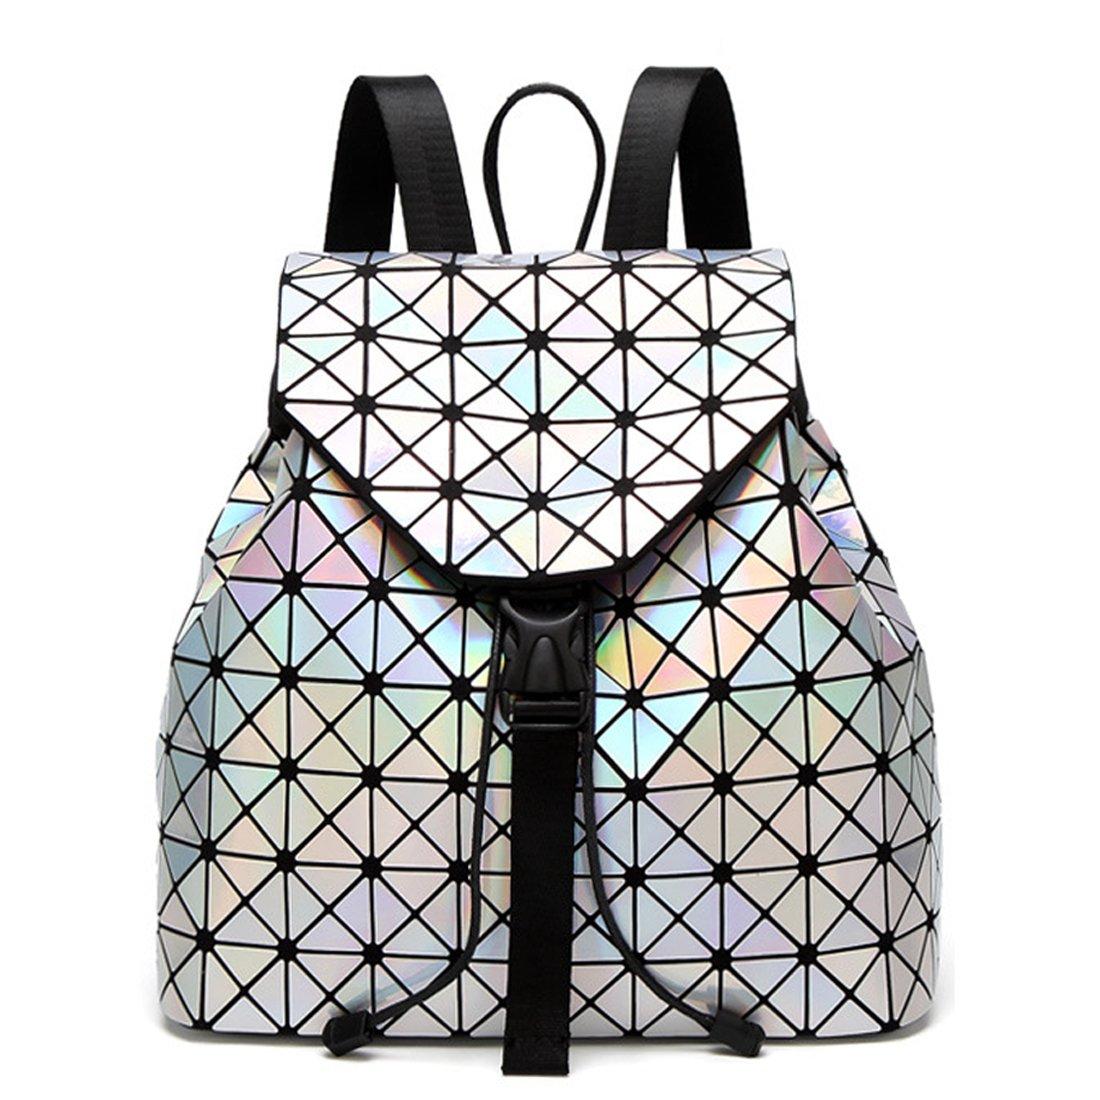 KAXIDY Sac à Dos Cartable Géométrique Lumineux Rhombe Laser Sequins Sacs à Dos Loisir (Style-01) KS61419